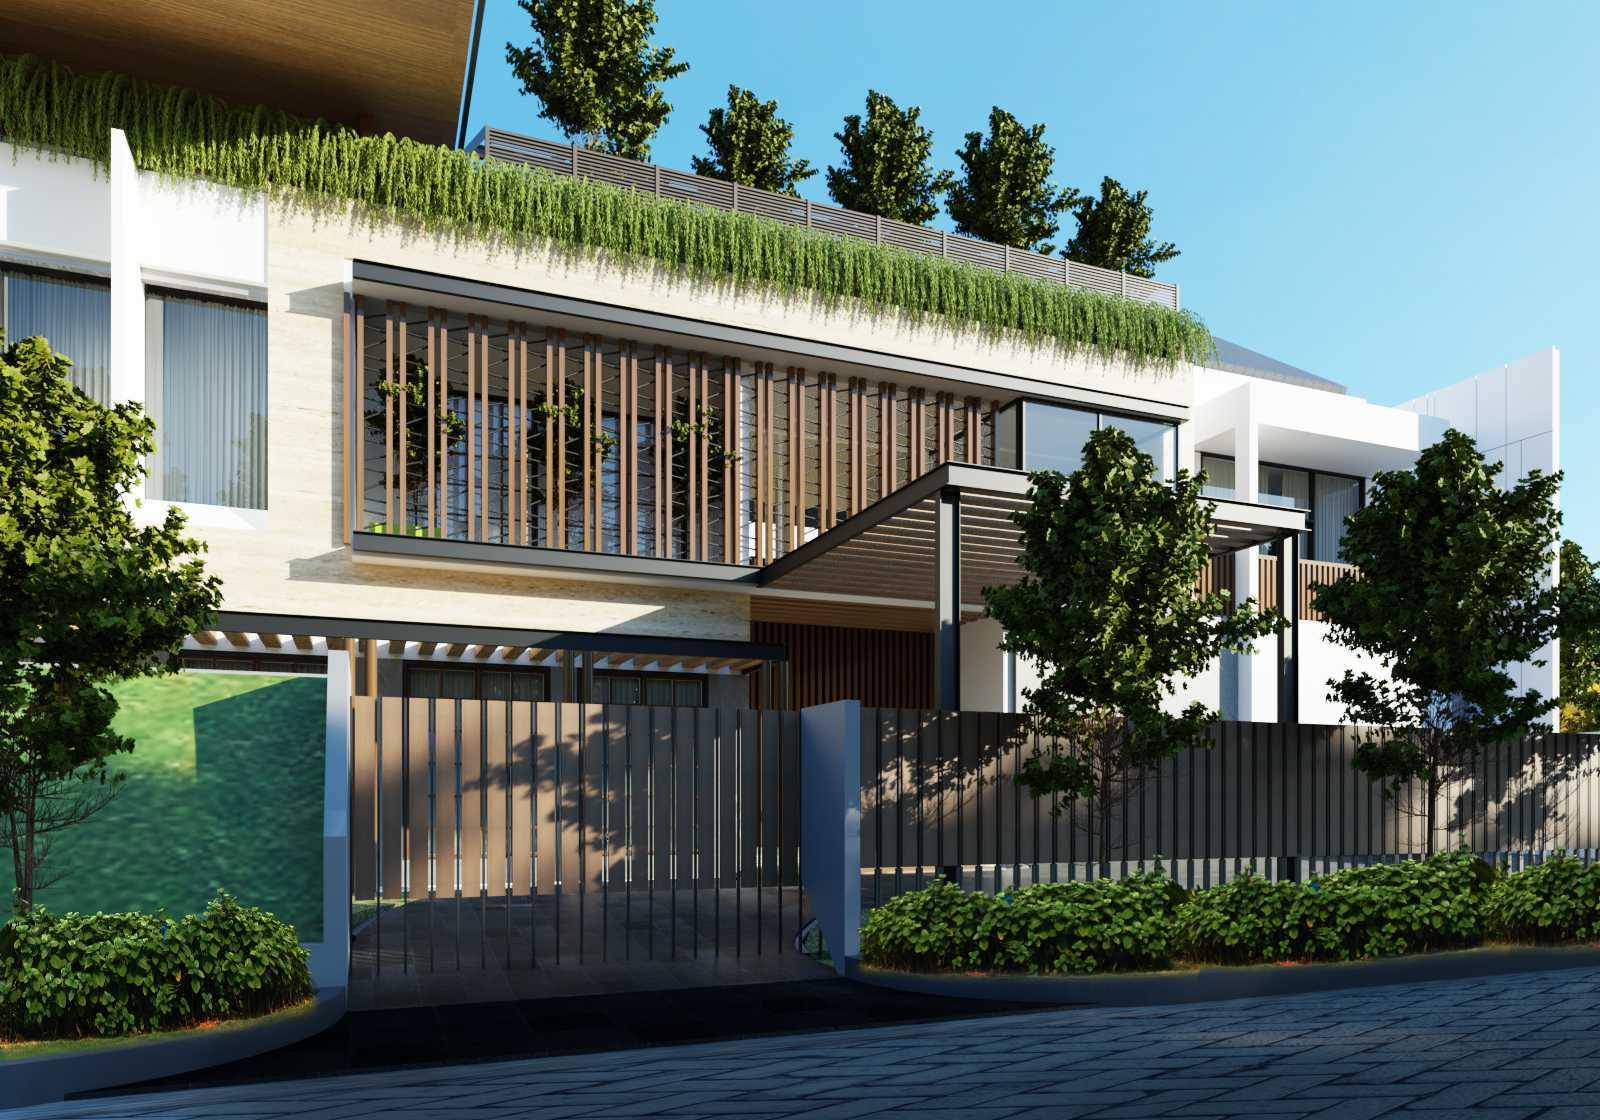 Pt Alradista Desain Indonesia T House Senayan, Jakarta Senayan, Jakarta Pt-Alradista-Desain-Indonesia-T-House  105895